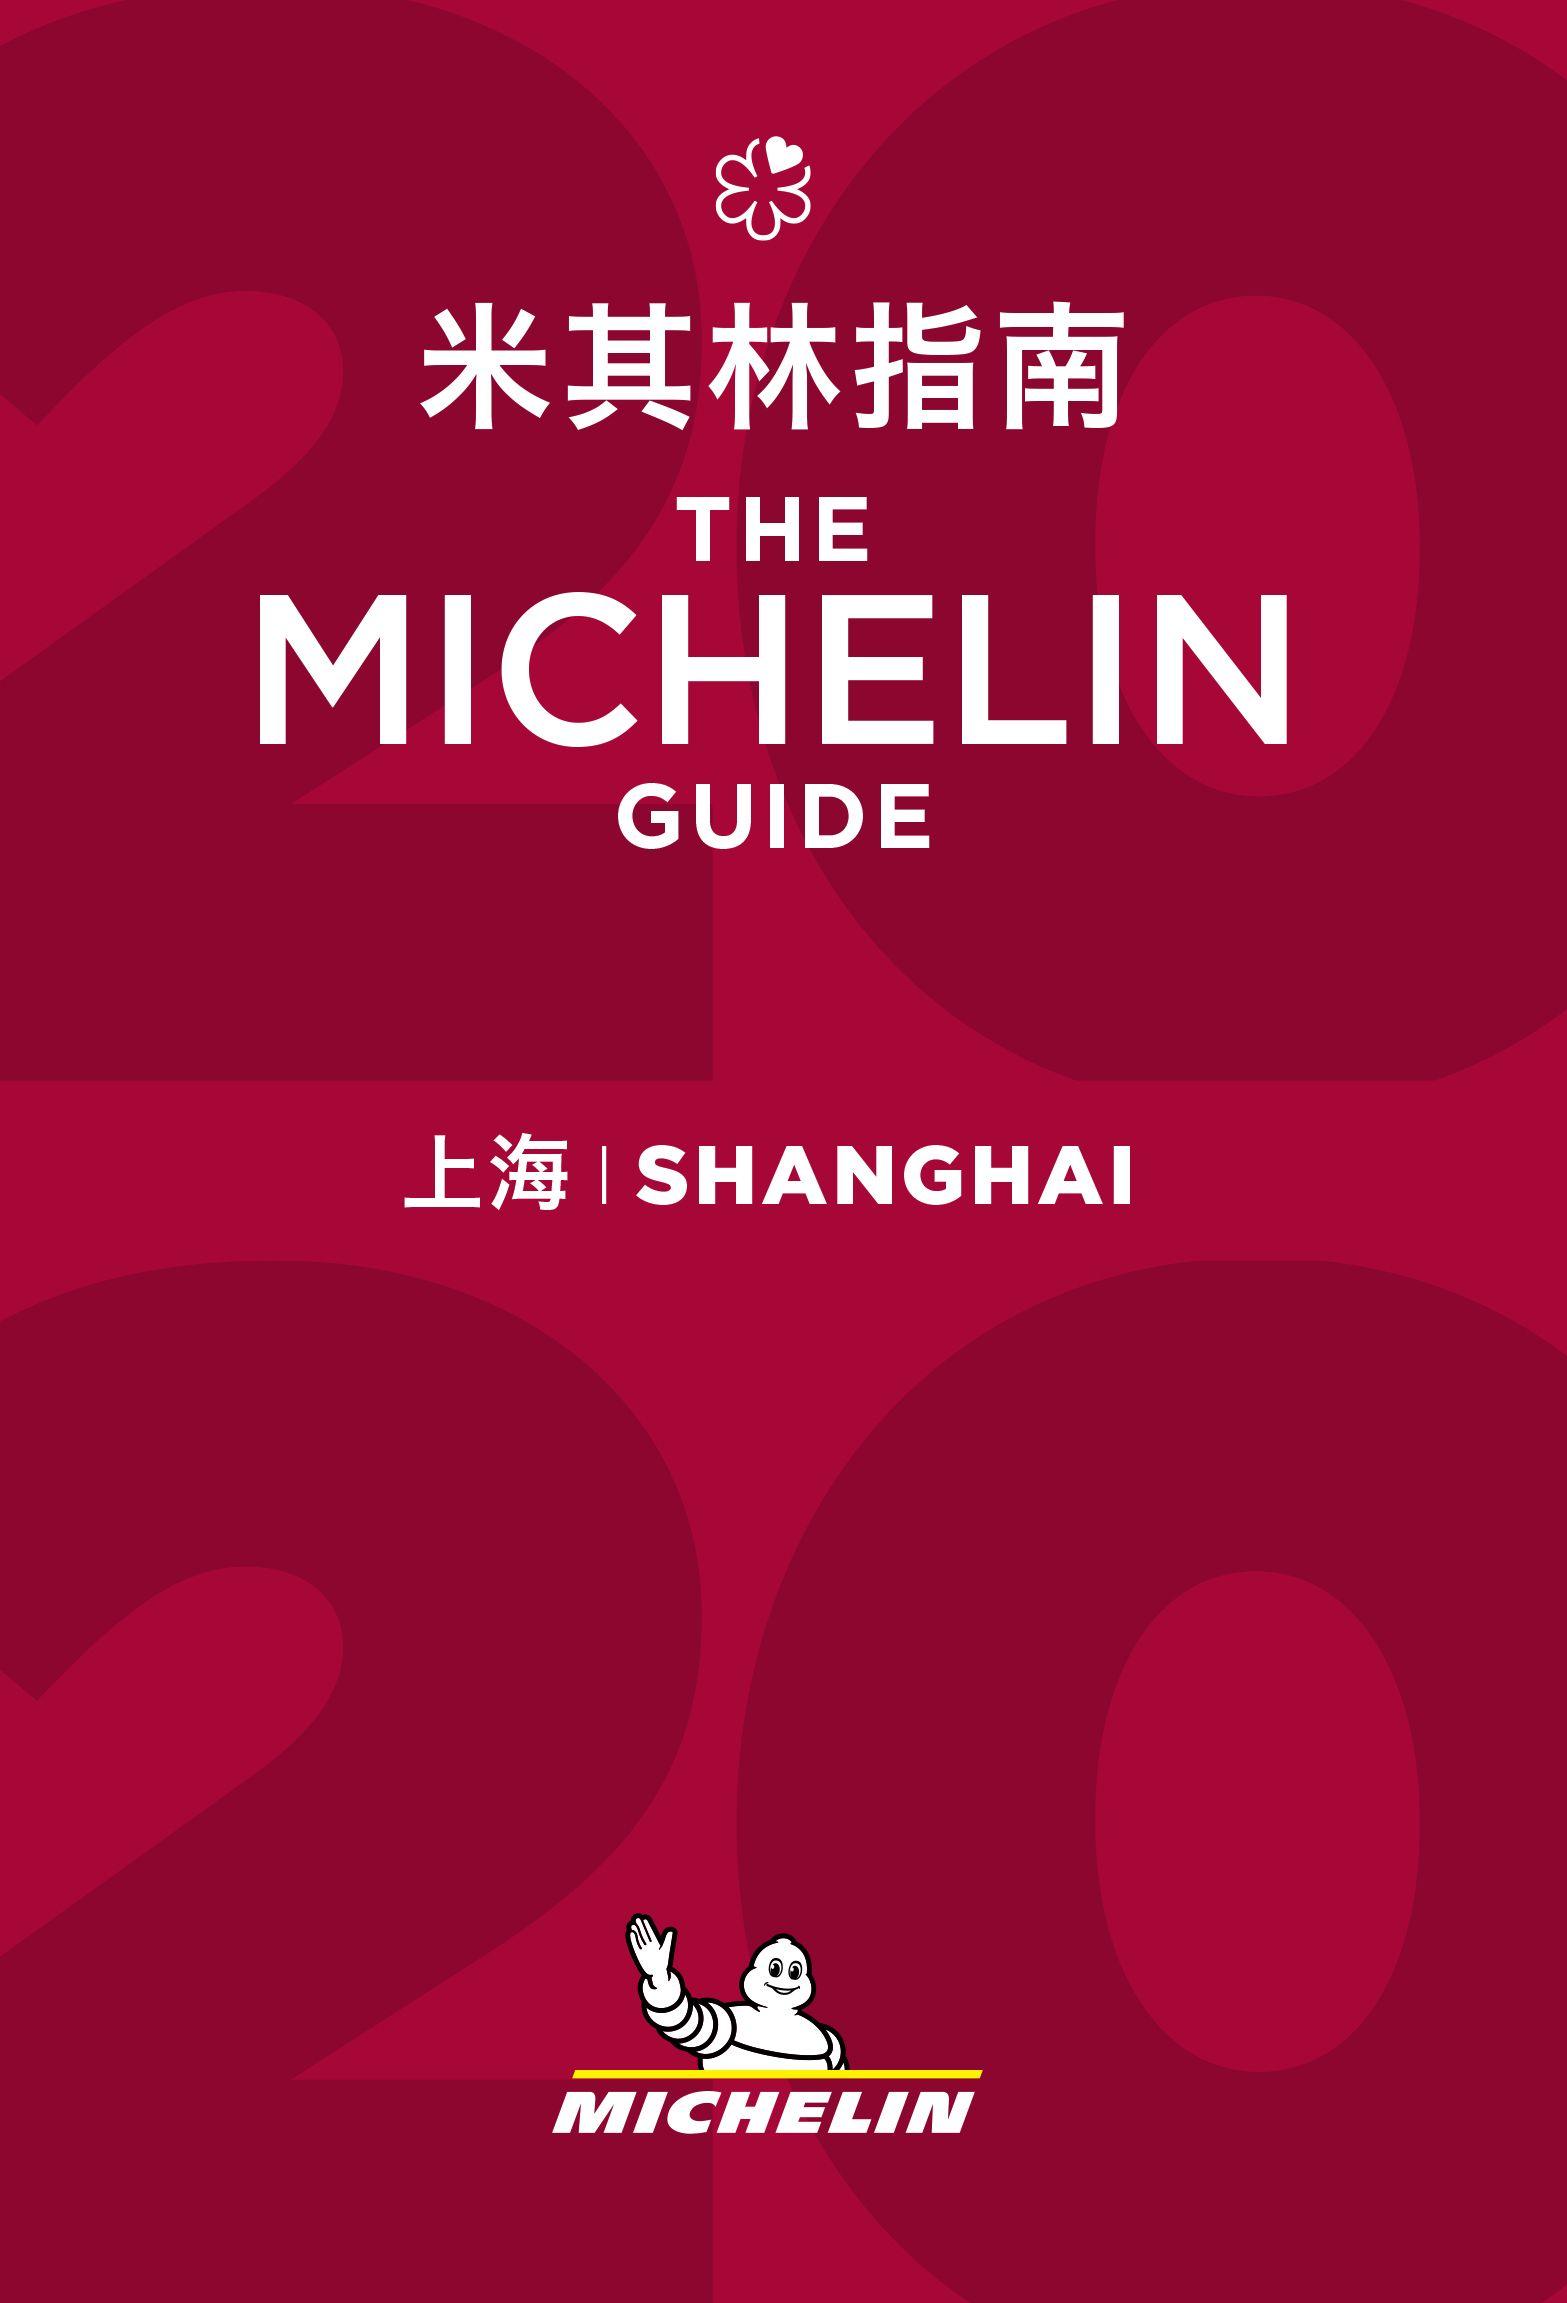 MICHELIN Guide Shanghai 2020 Award Winners Unveiled